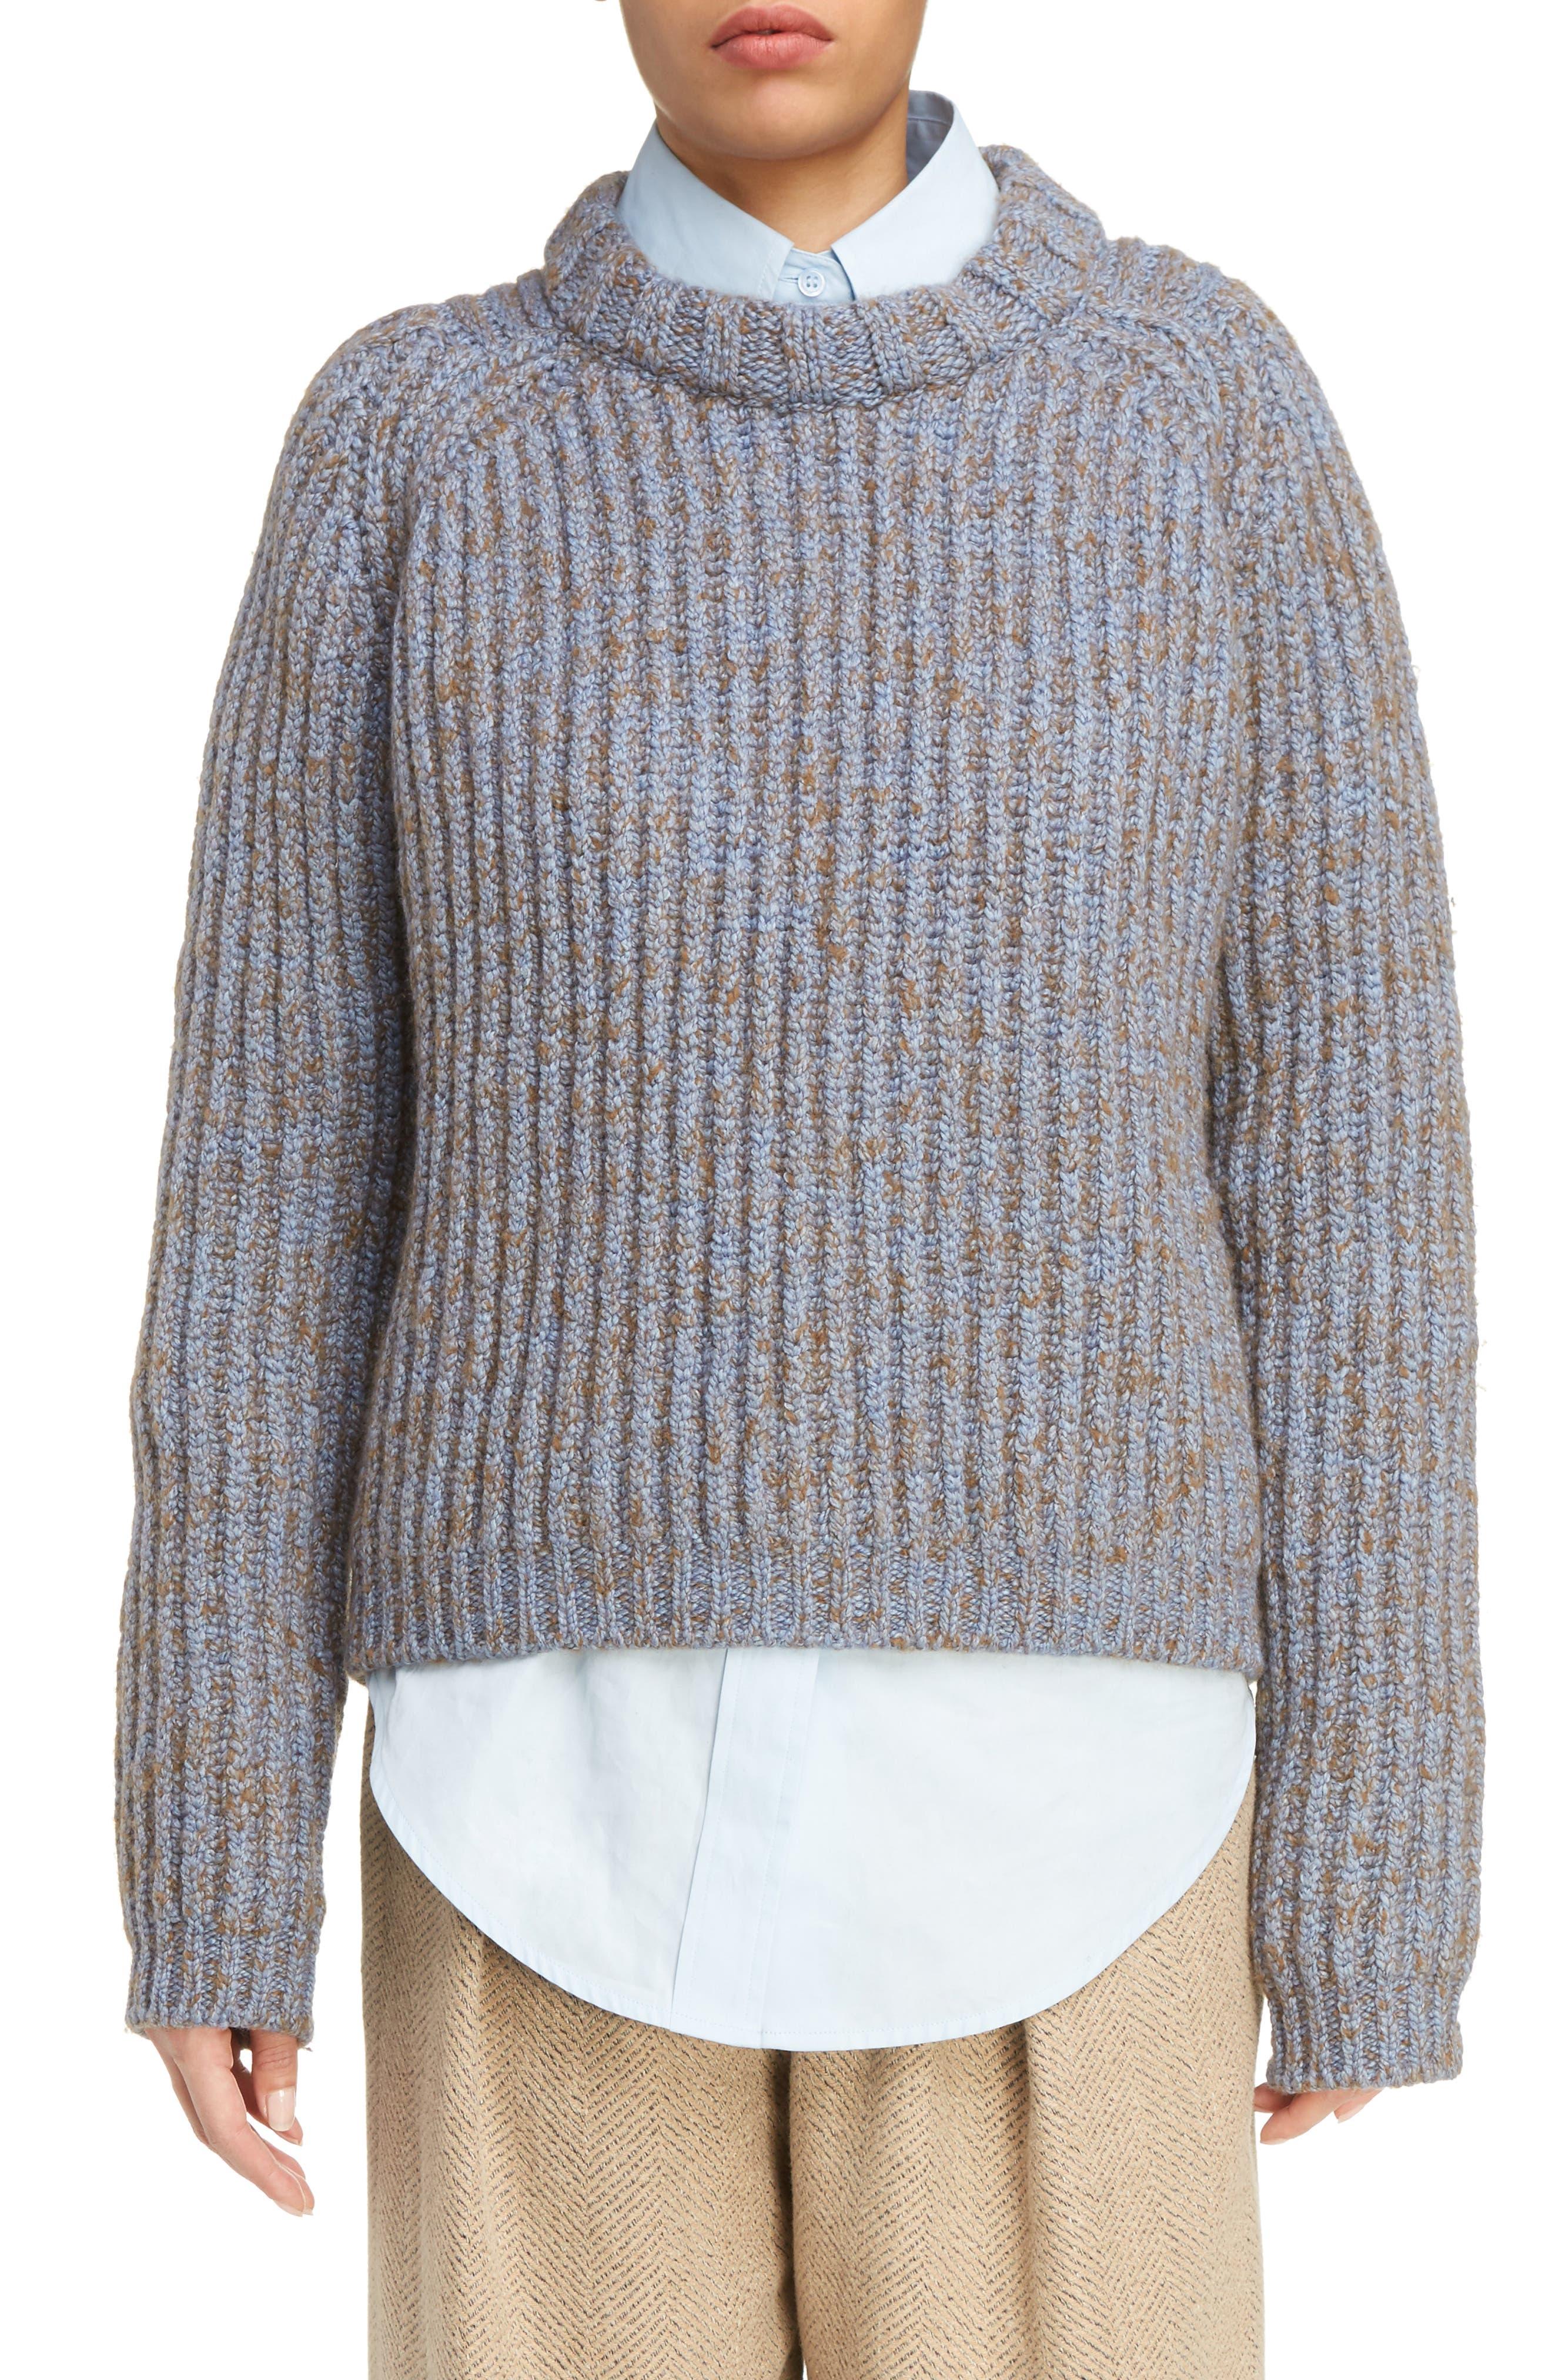 Sandy Mouline Cable Knit Sweater,                         Main,                         color, 400